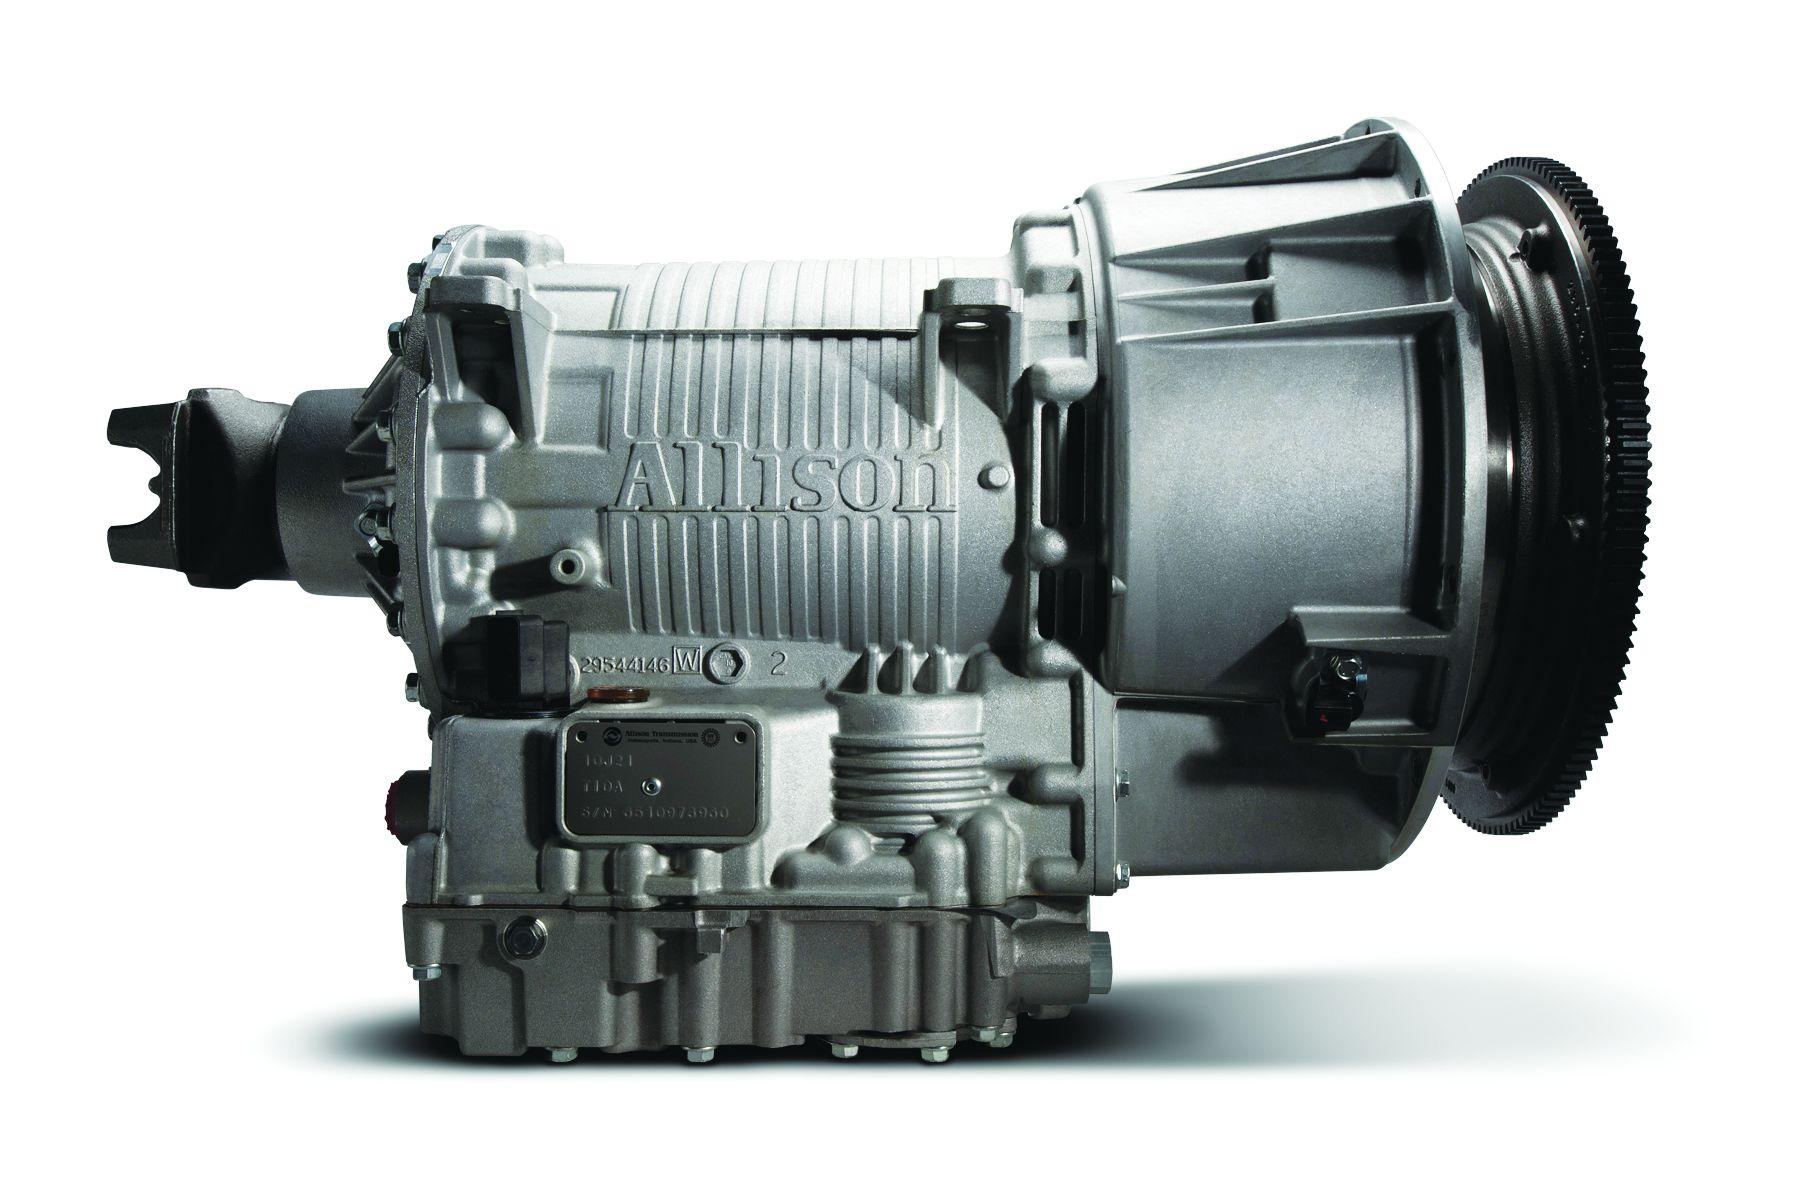 Transmissions Drive Medium-Duty Truck Fuel Efficiency